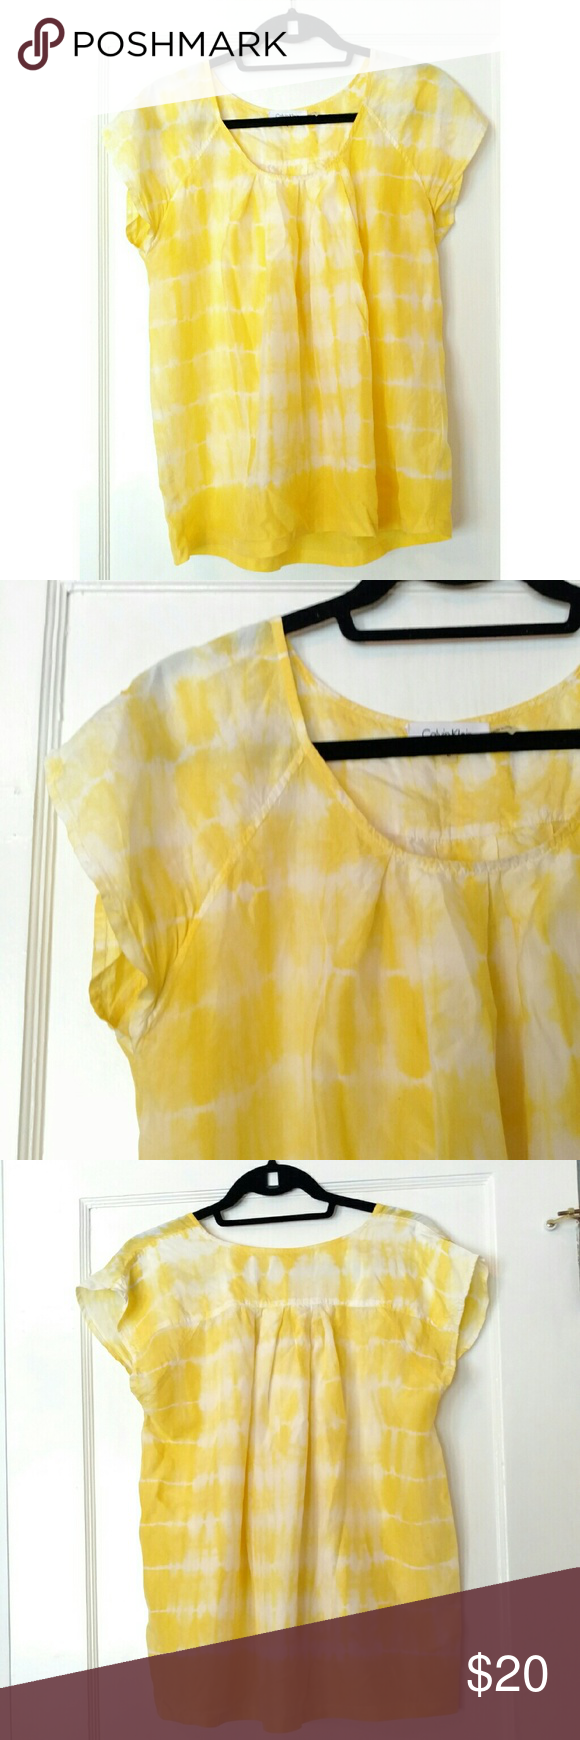 Calvin Klein Tie Dye Silk Blouse 100% silk short sleeve blouse from Calvin Klein.  Yellow and white tie dye design. Soft and lightweight. Perfect flowy, comfortable summer shirt. Calvin Klein Tops Blouses